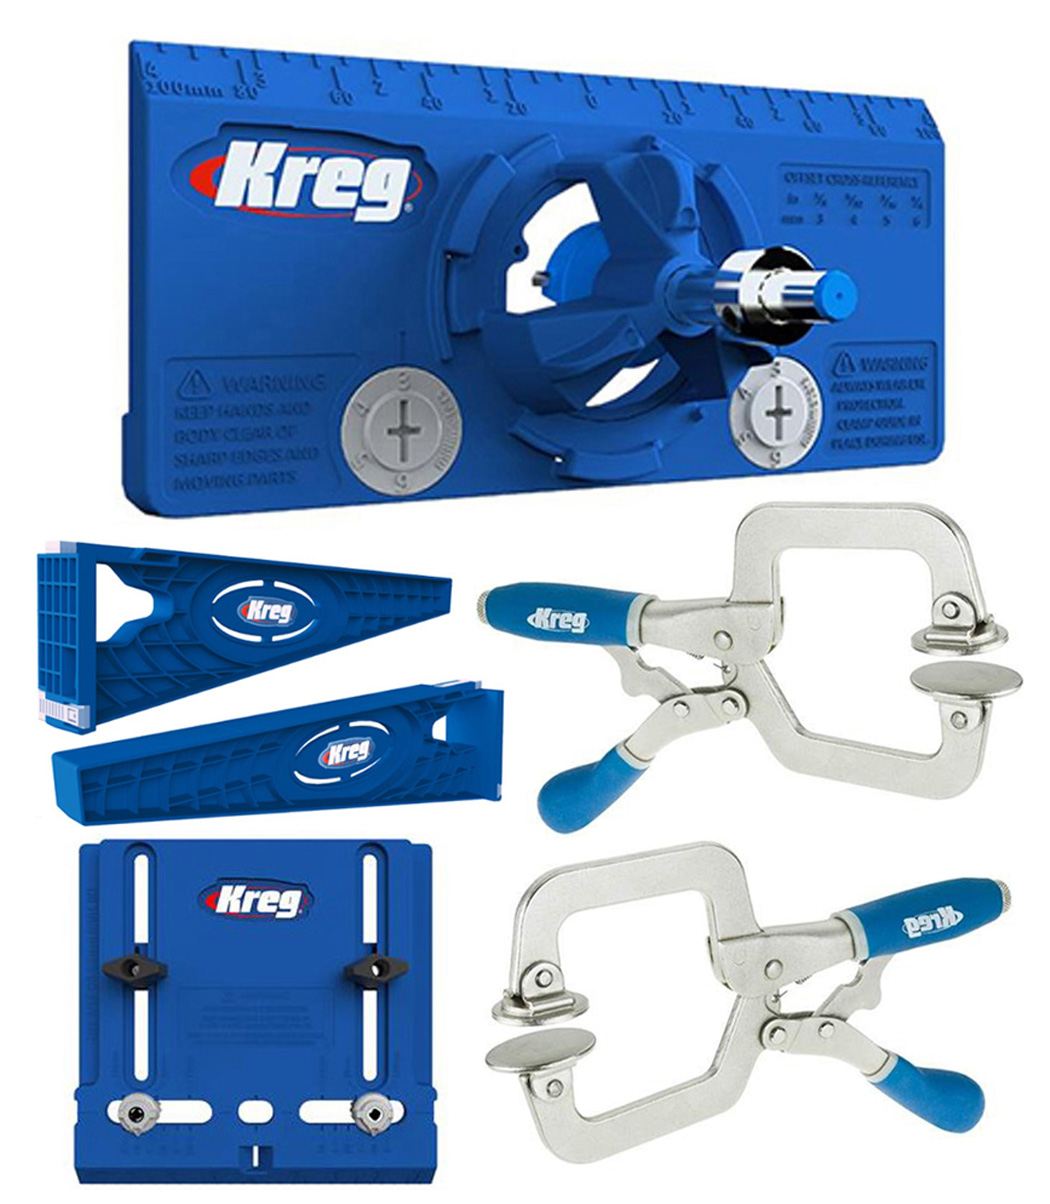 Kreg Drawer Slide Mounting Tool, Cabinet Hardware Jig, Hinge Jig, & 2 Face Clamp by Kreg